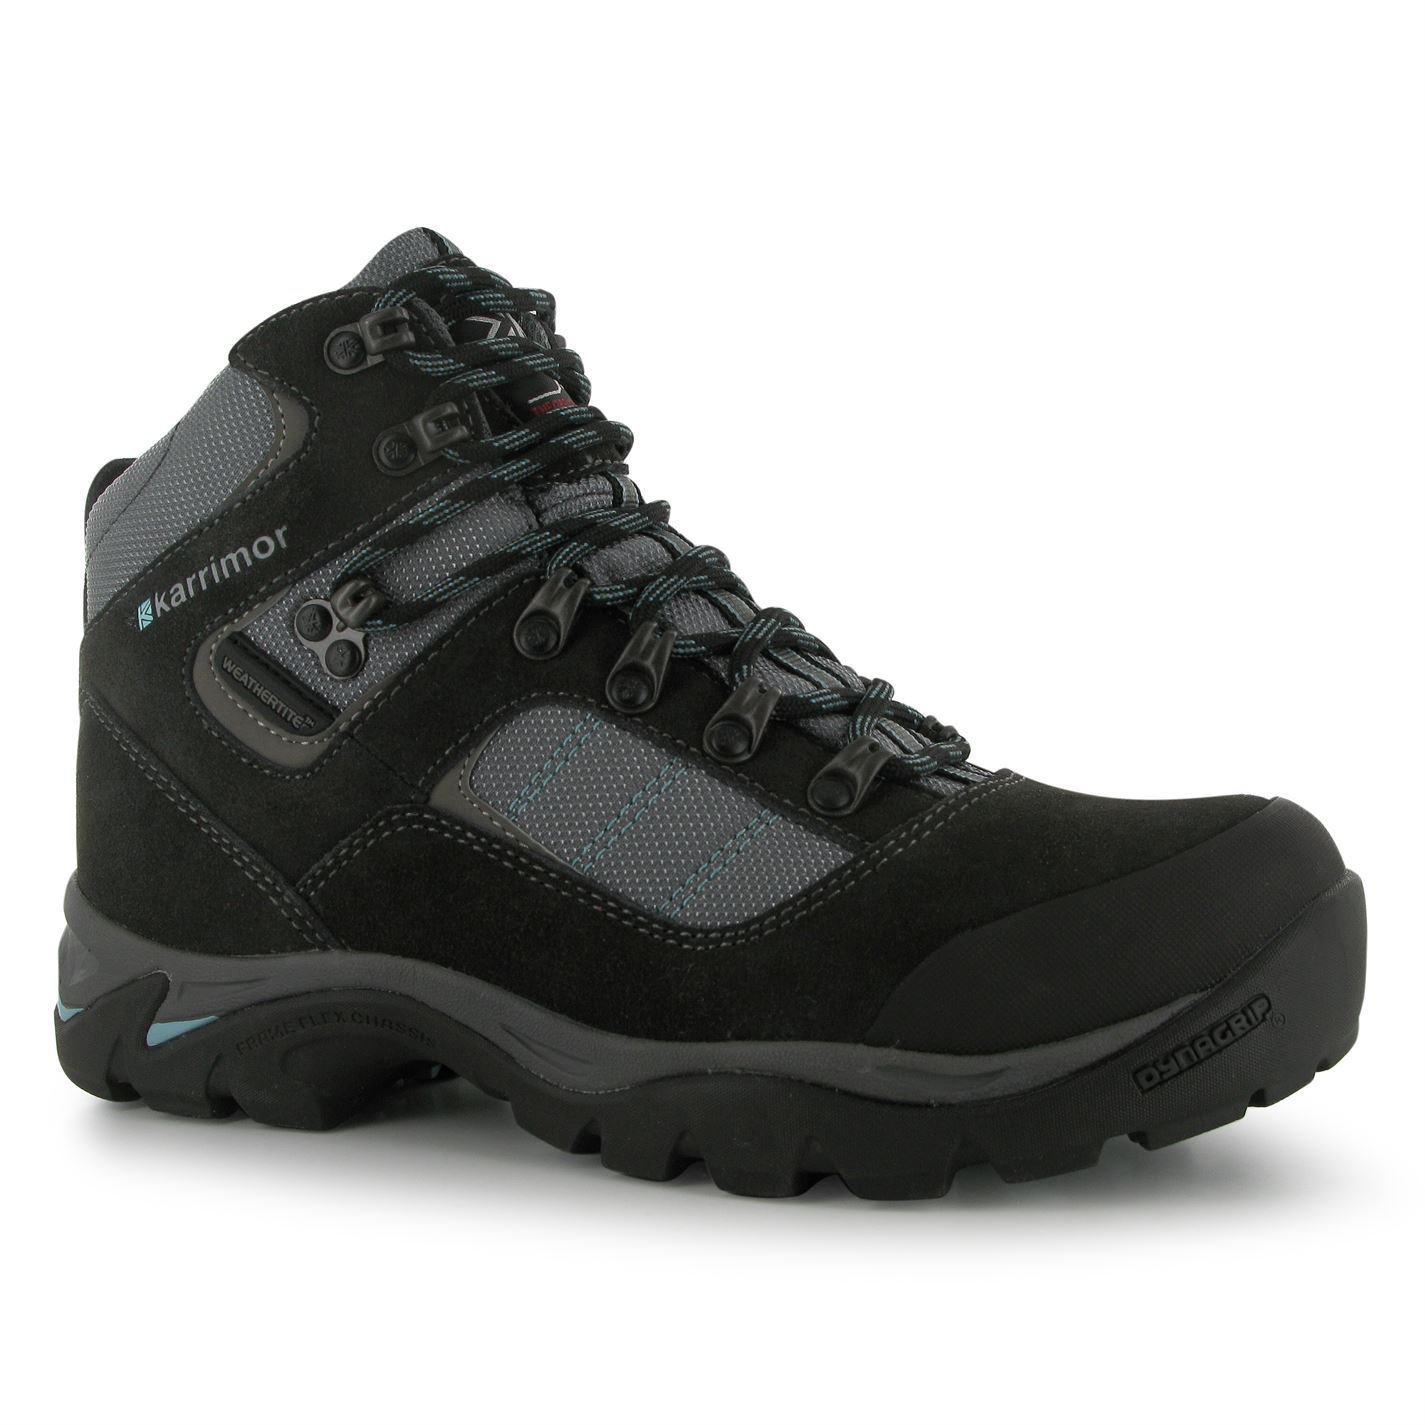 Karrimor Womens Ladies ksb 200 Walking Boots Lace Up Hiking Trekking Footwear